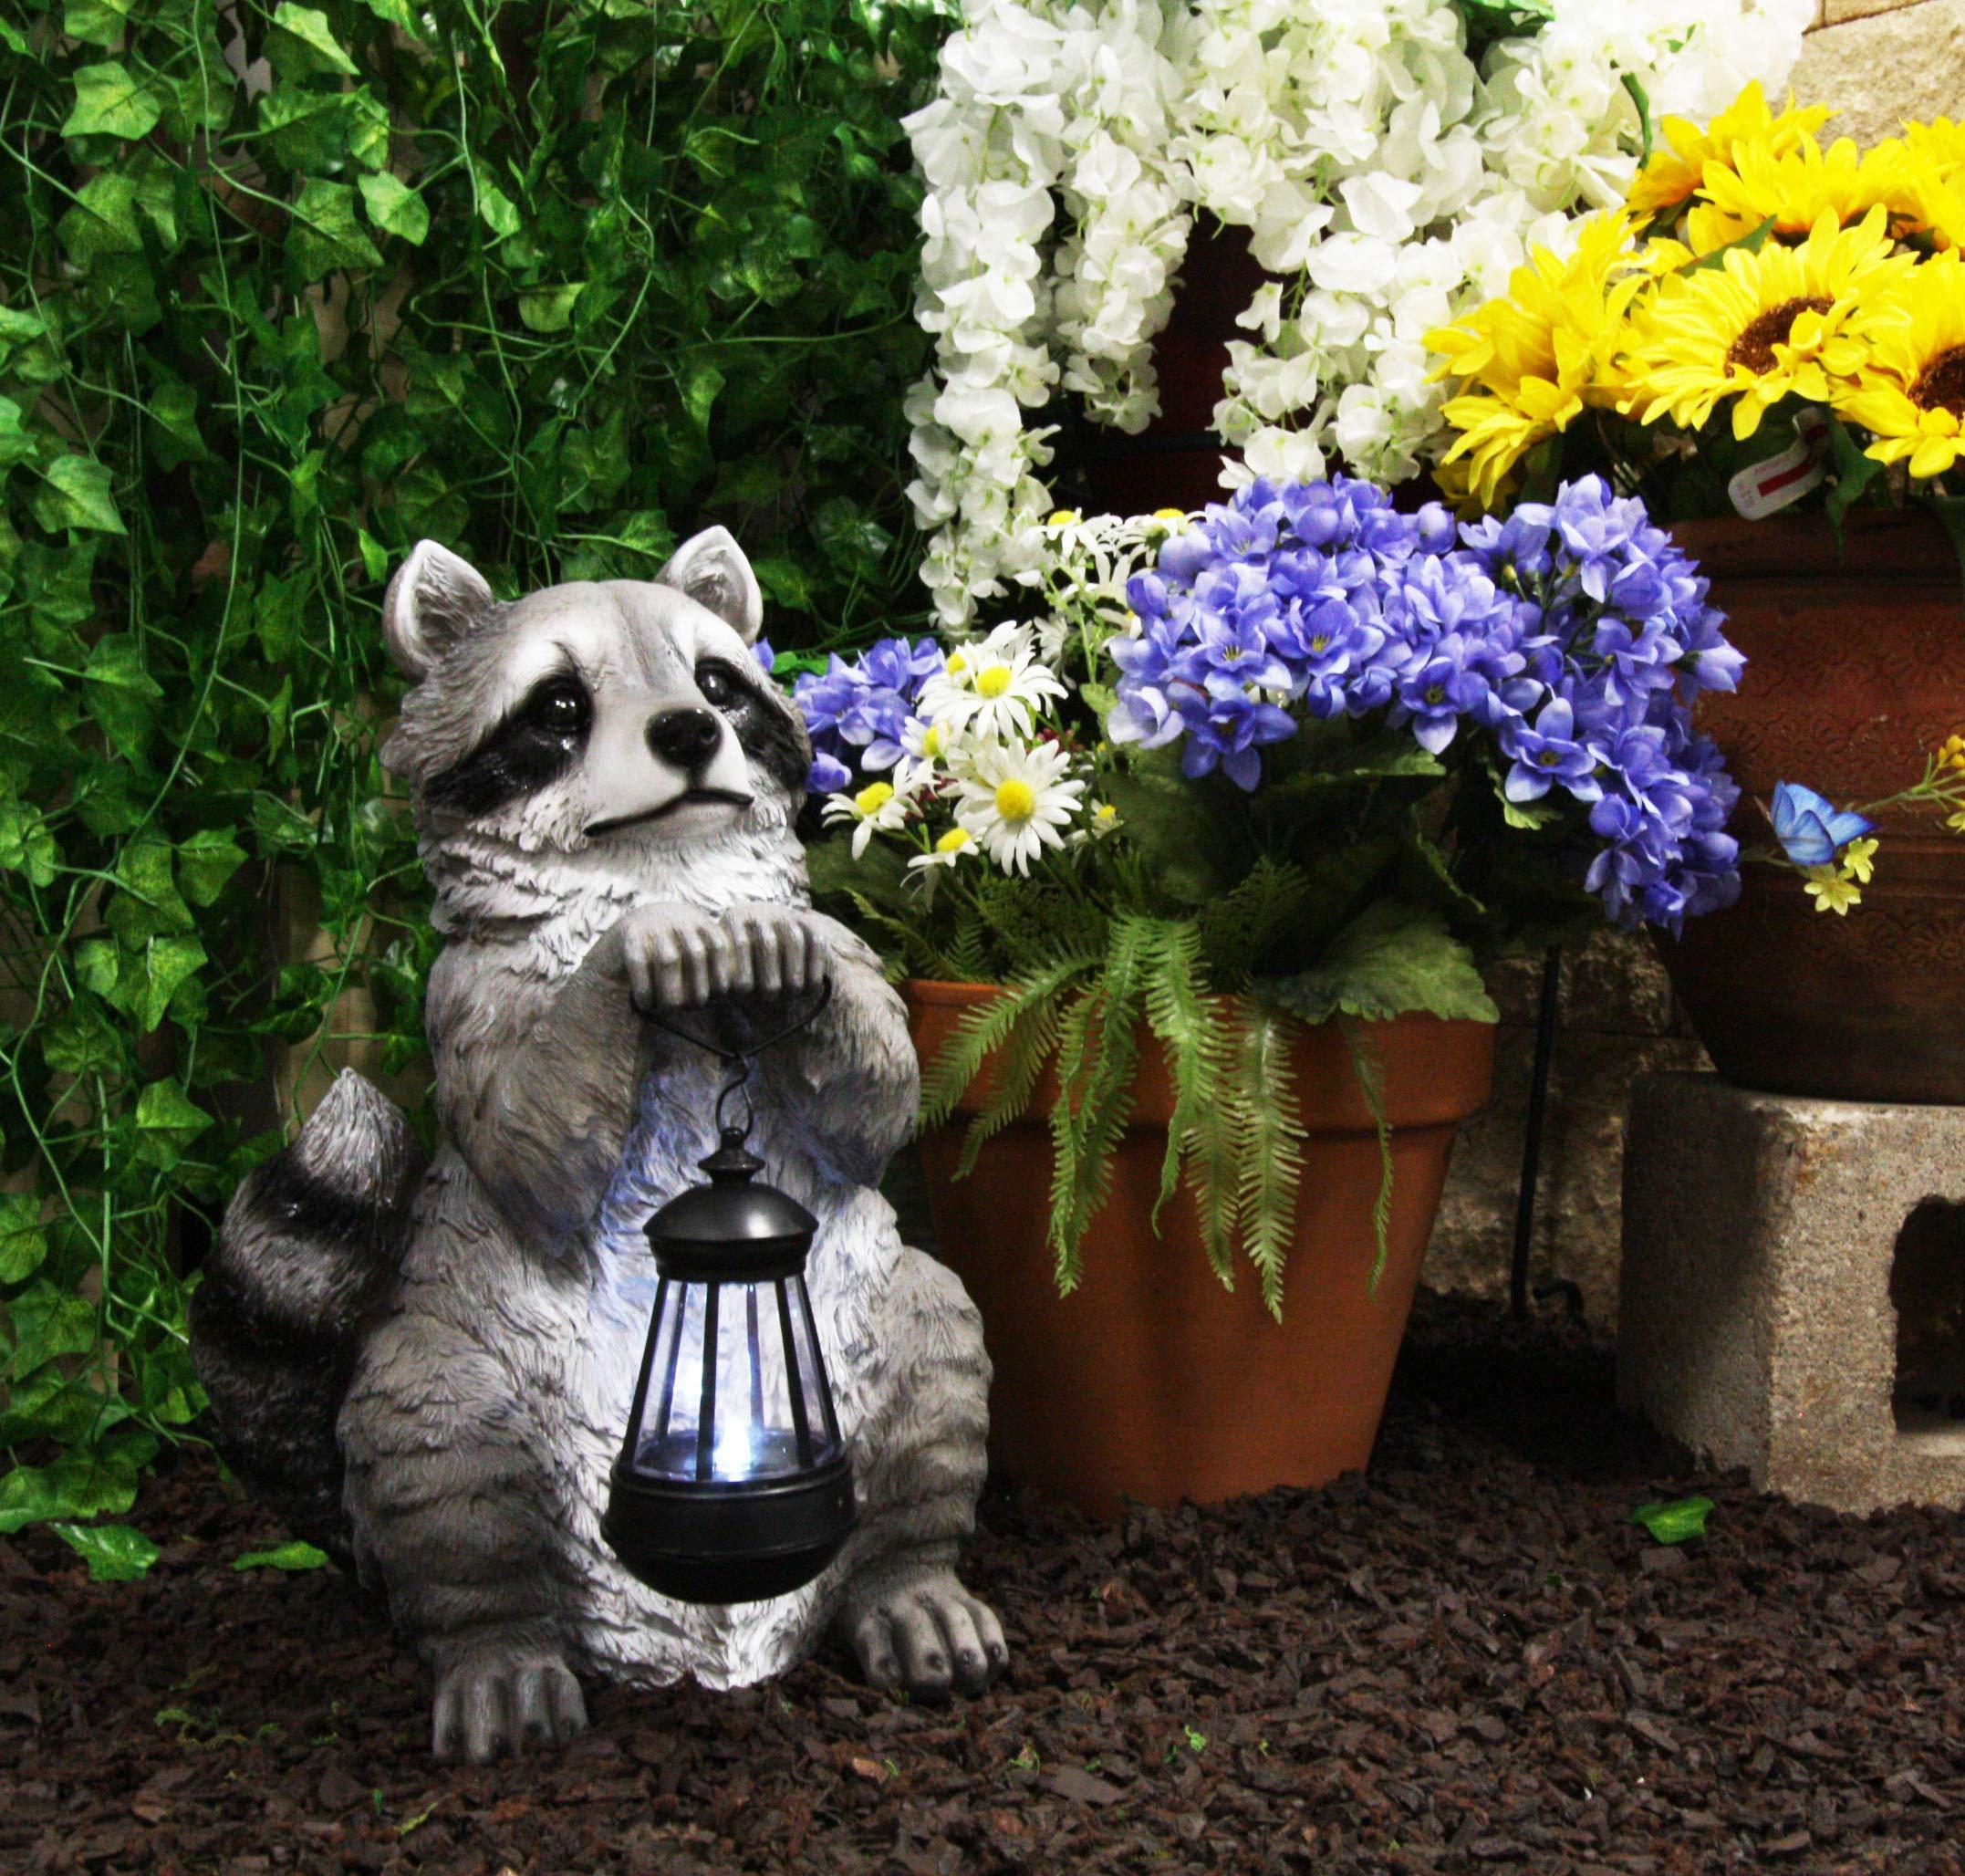 Ebros Night Bandit North American Raccoon Statue Holding Solar Powered Lantern LED Light Patio Decor Indoor Outdoor Raccoons Animal Sculpture Decorative by Ebros Gift